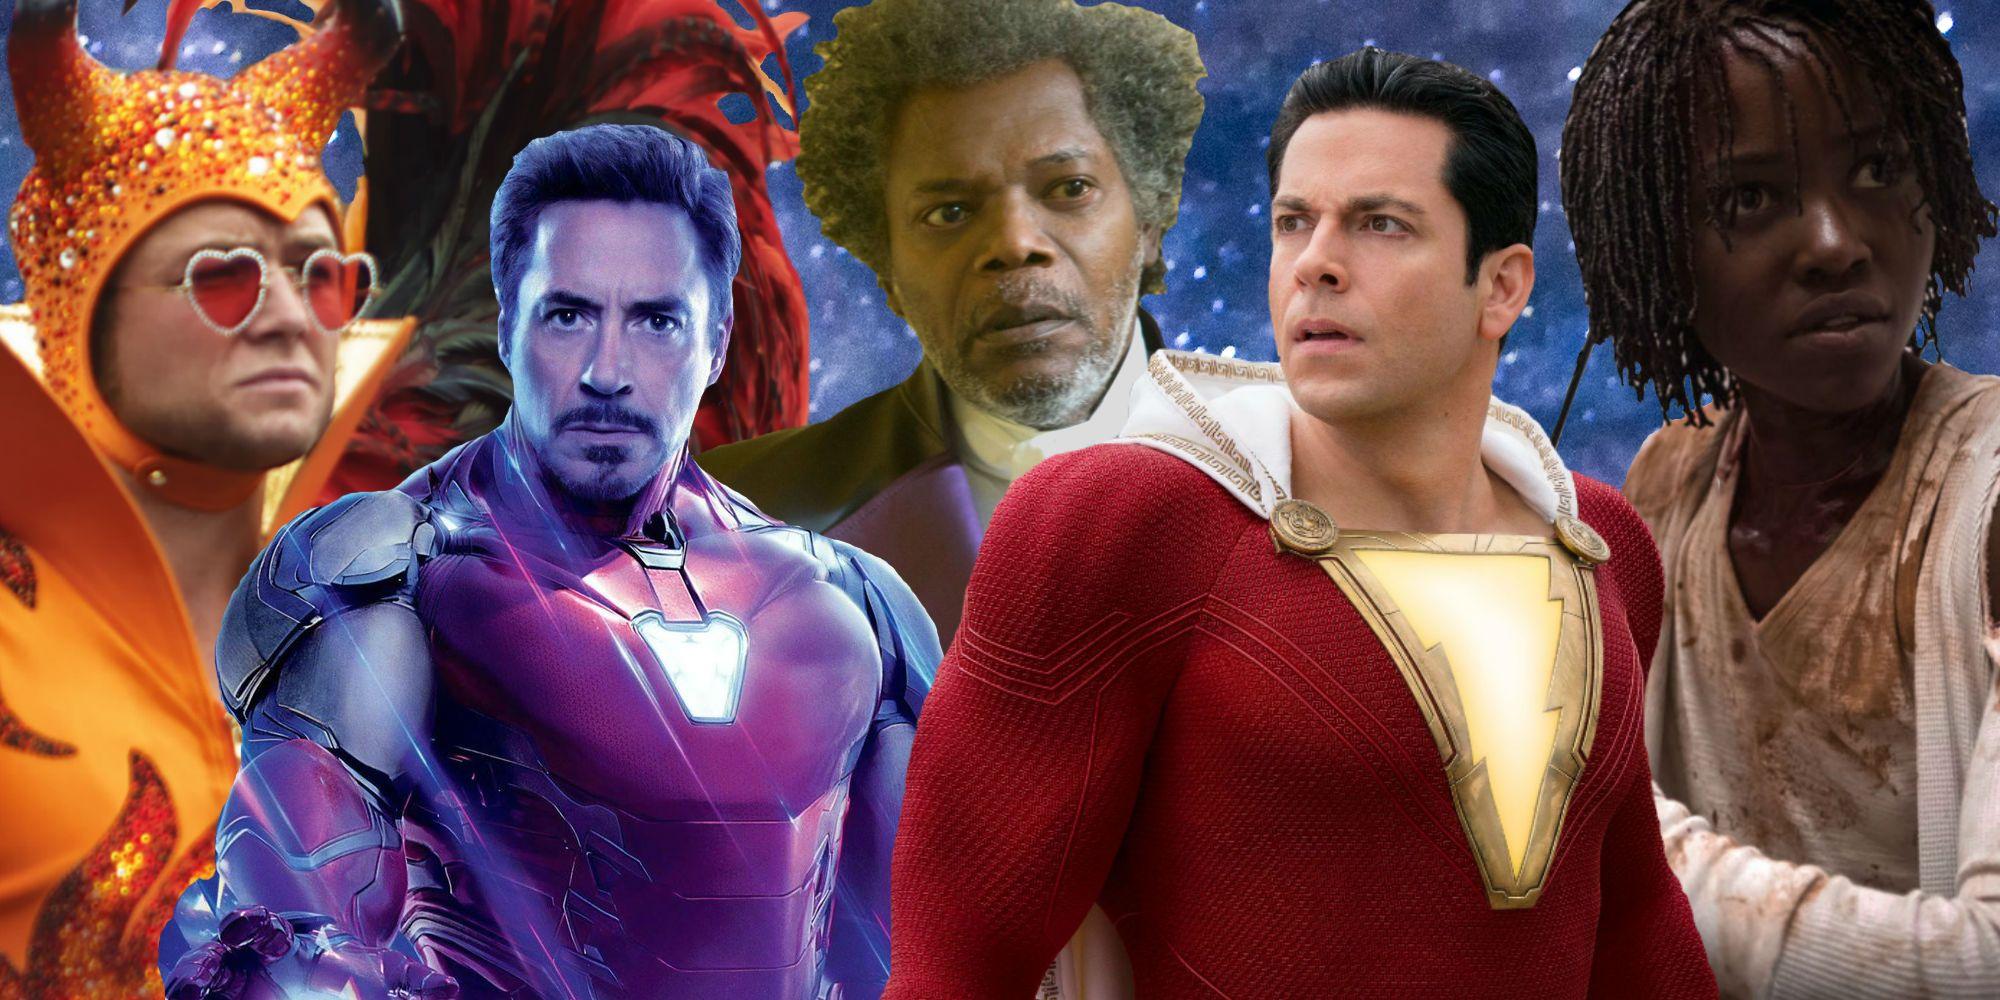 Best movies 2019 - Best films of 2019